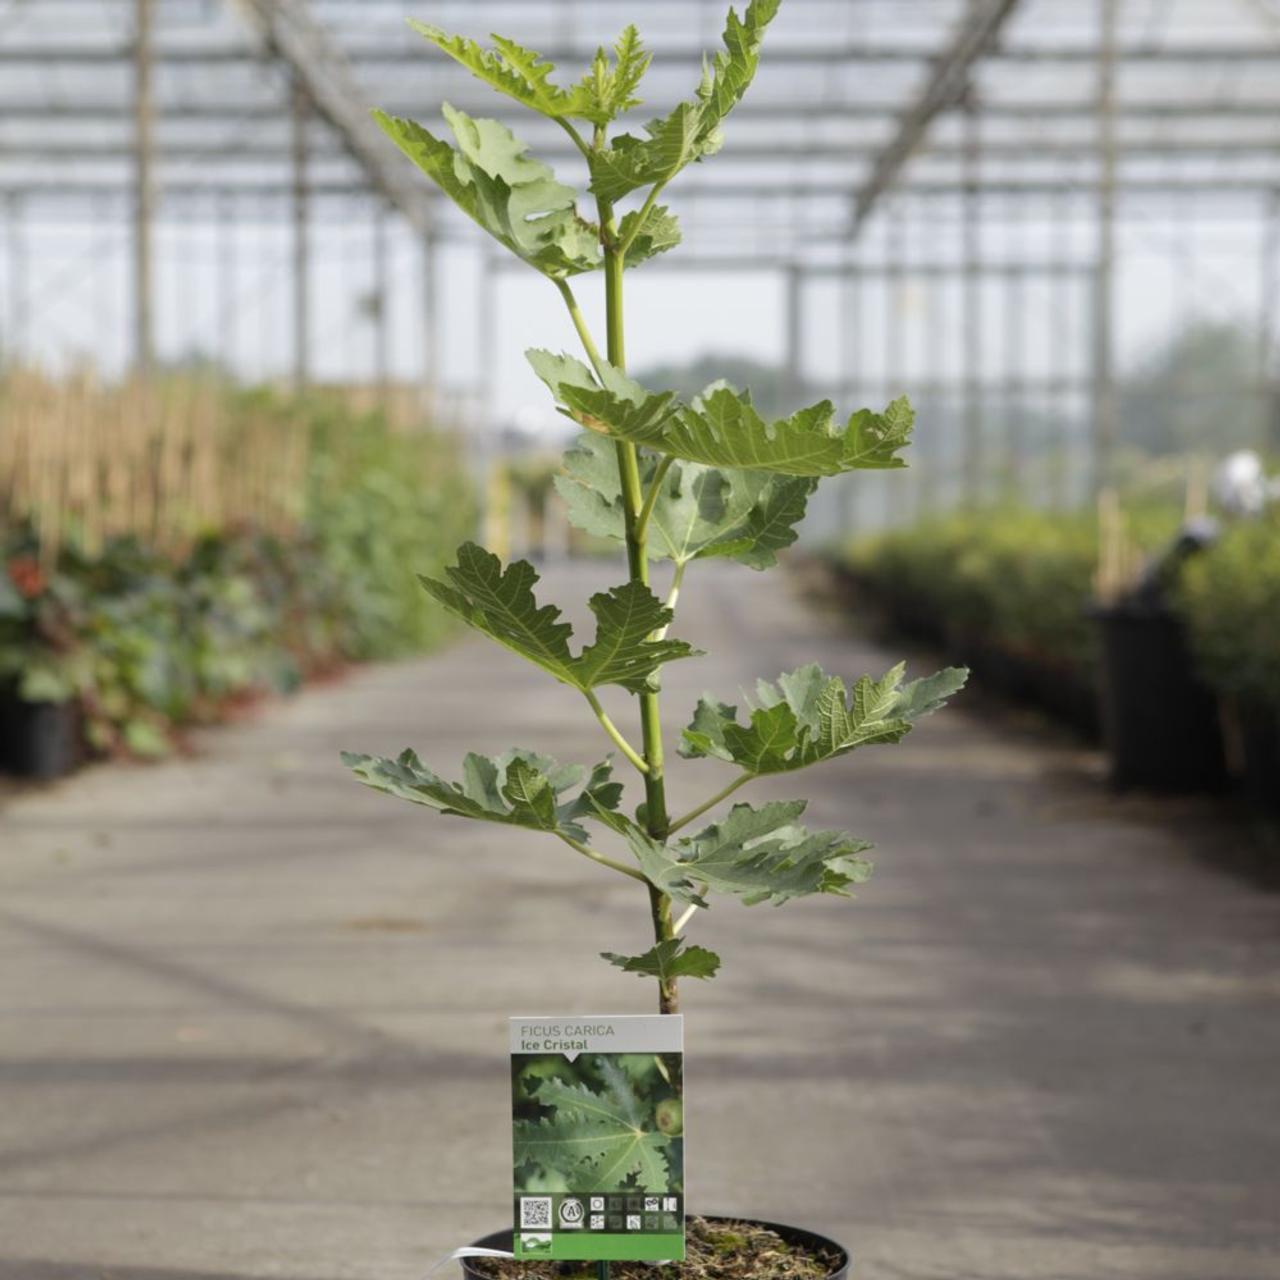 Ficus carica 'Ice Crystal' plant